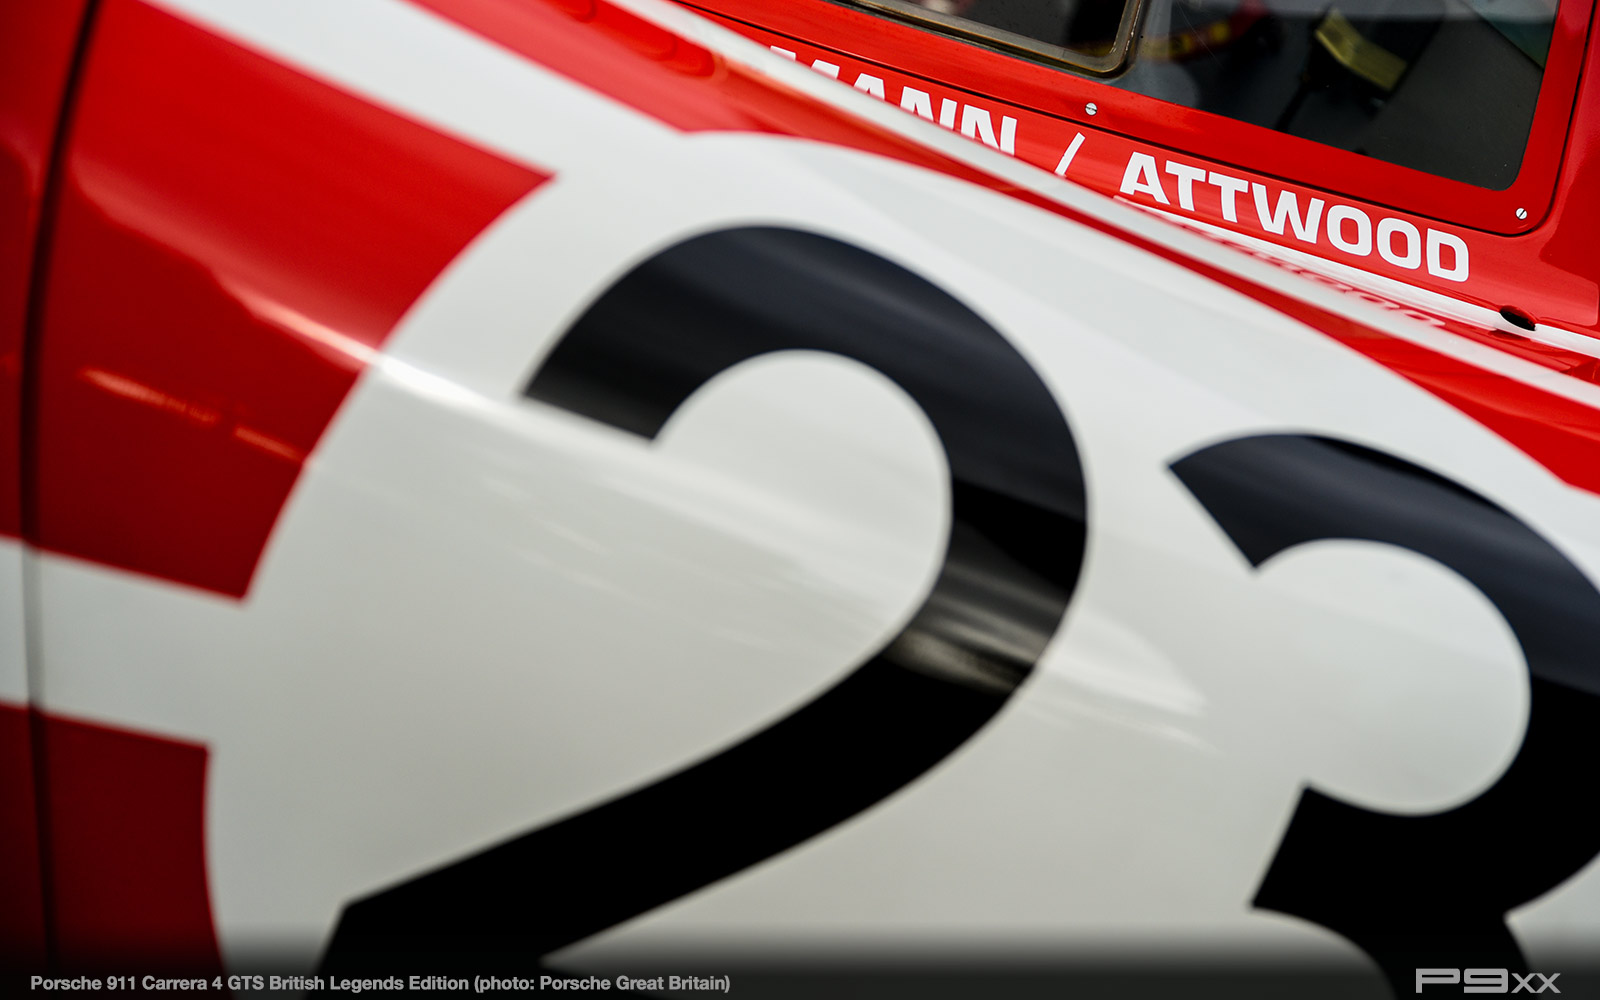 Porsche-911-Carrera-4-GTS-British-Legends-Edition-363